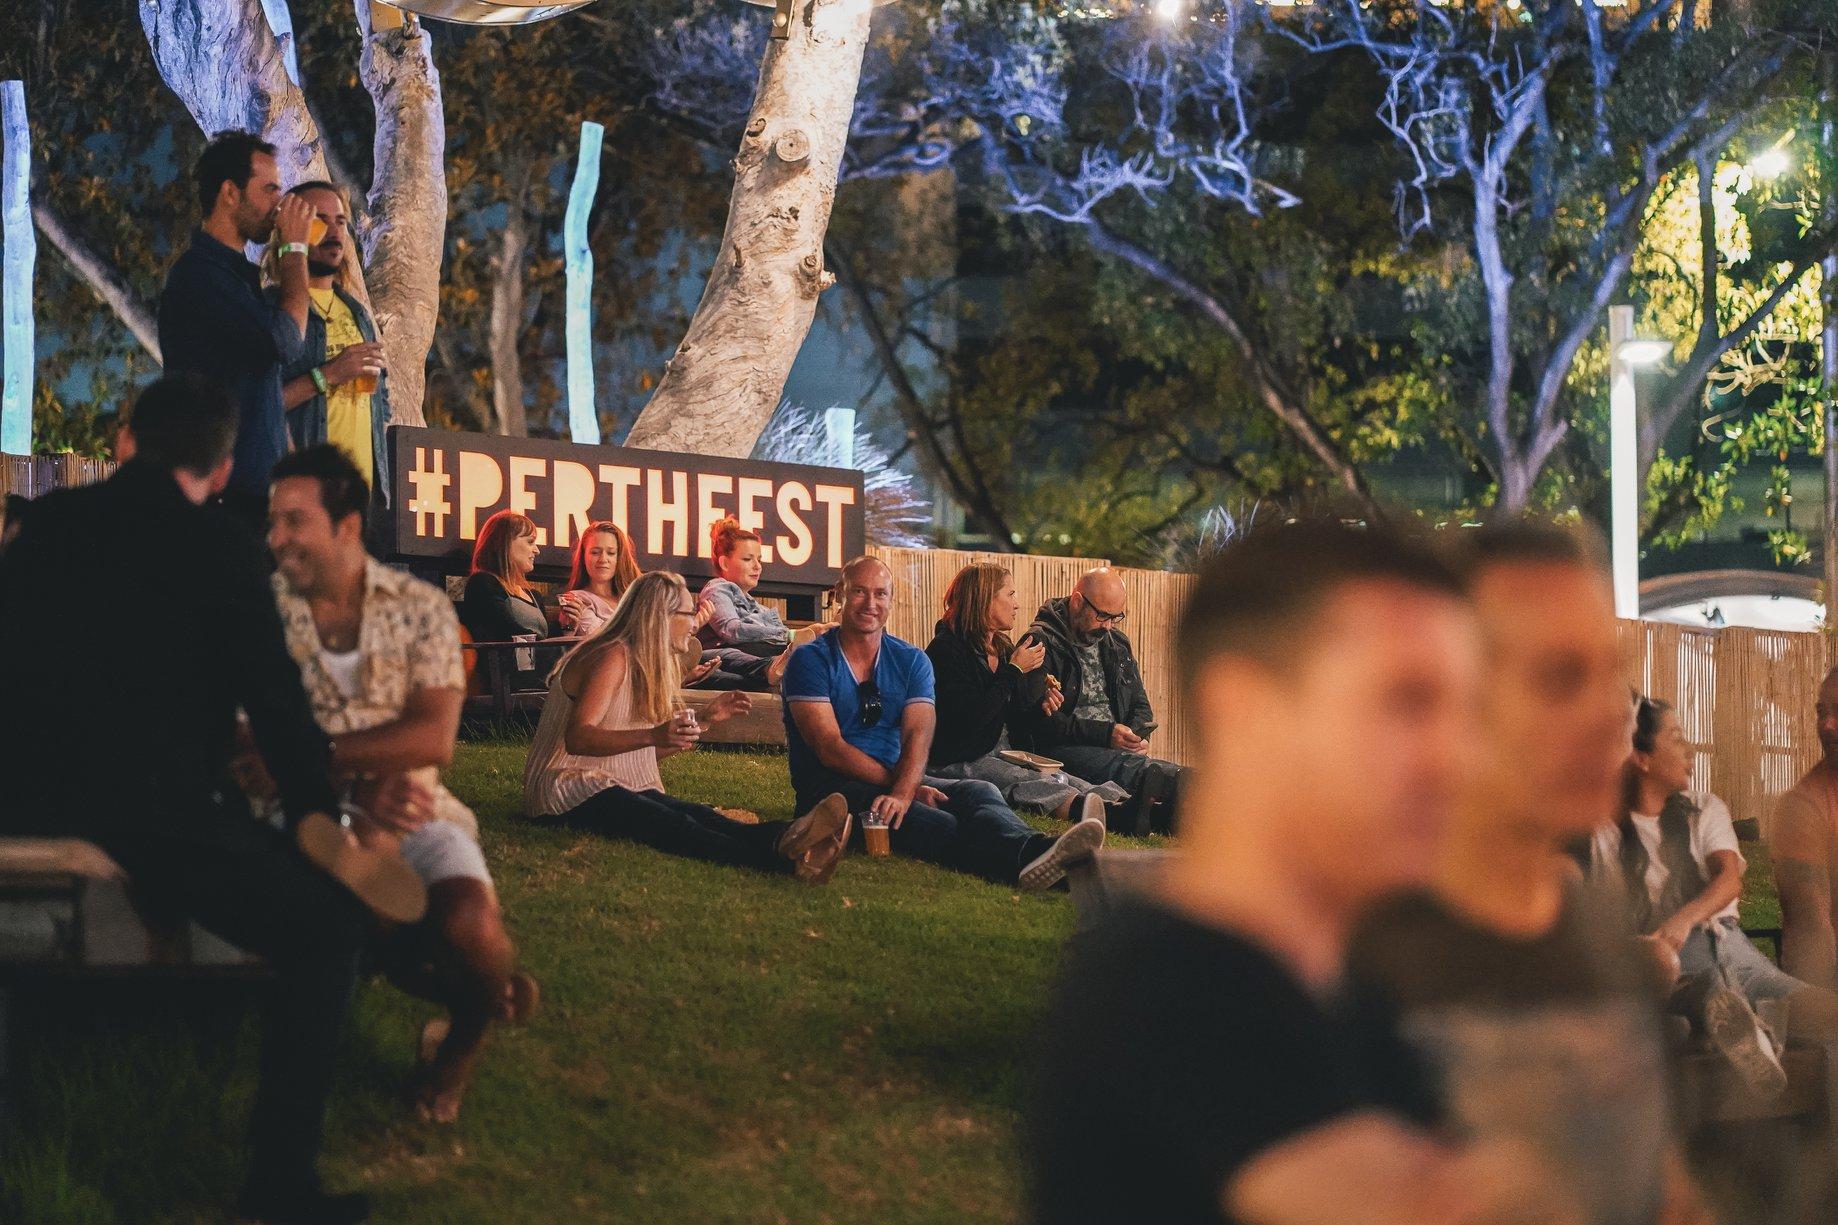 Perth Fest